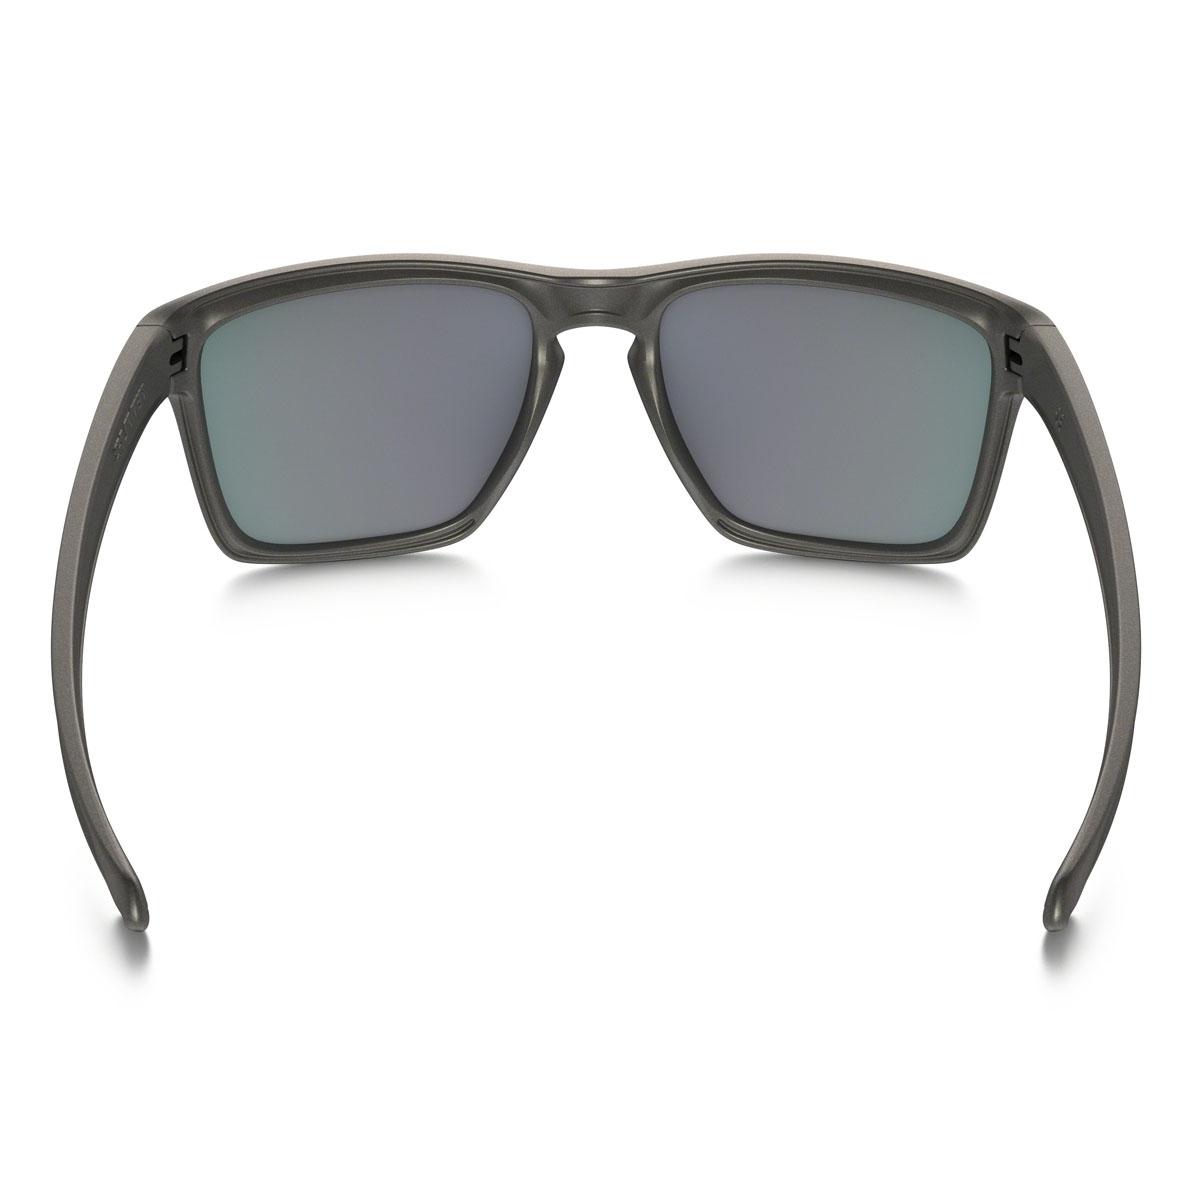 7a5656cc01930 ... Image of Oakley Sliver XL Sunglasses - Lead Frame   Torch Iridium Lens  ...